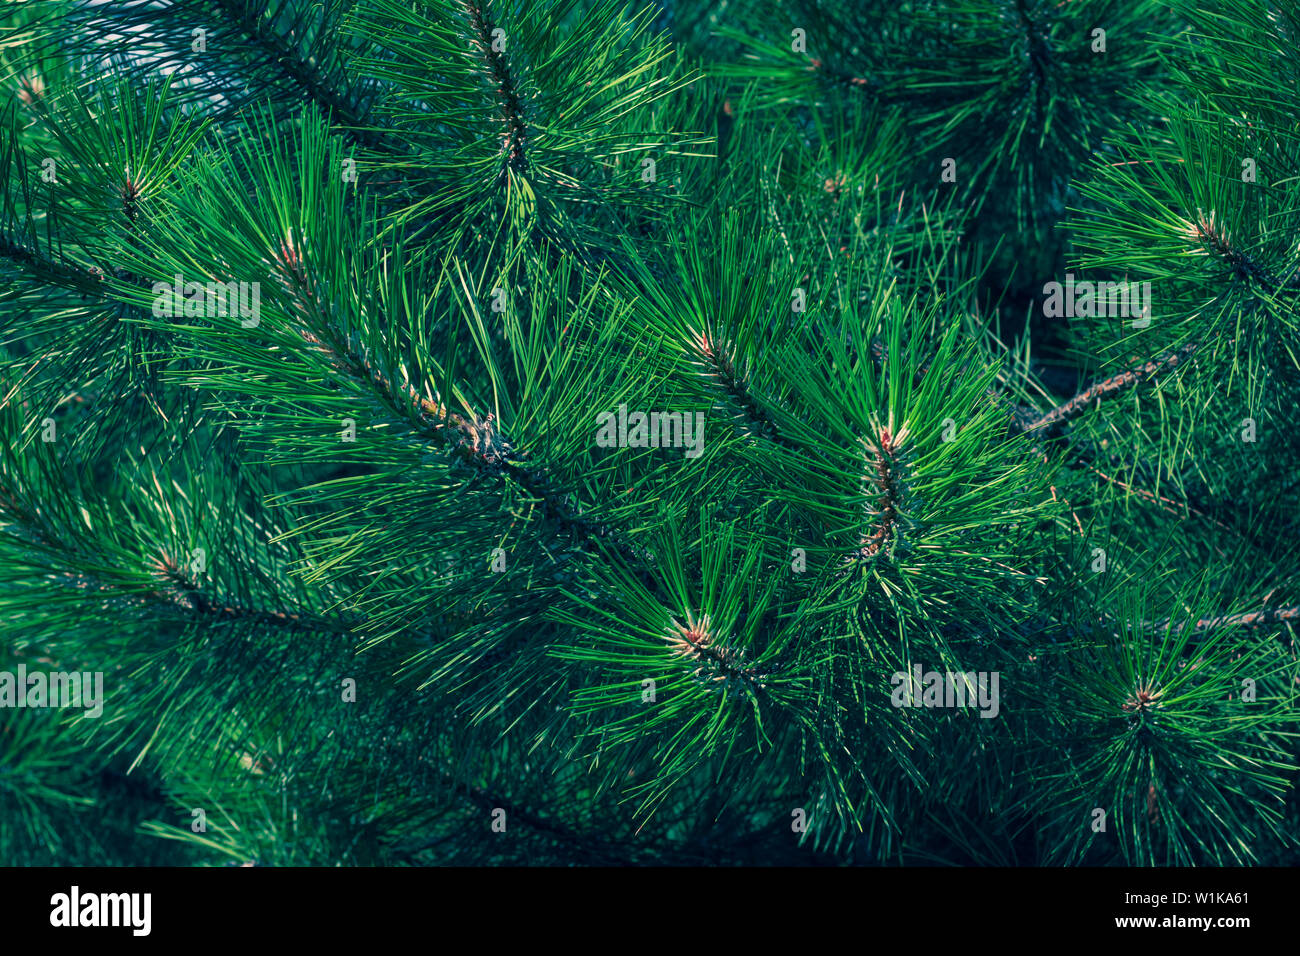 Green fir branch of a christmas tree. Coniferous needles close-up. Pine-tree background. Scotch fir. - Stock Image